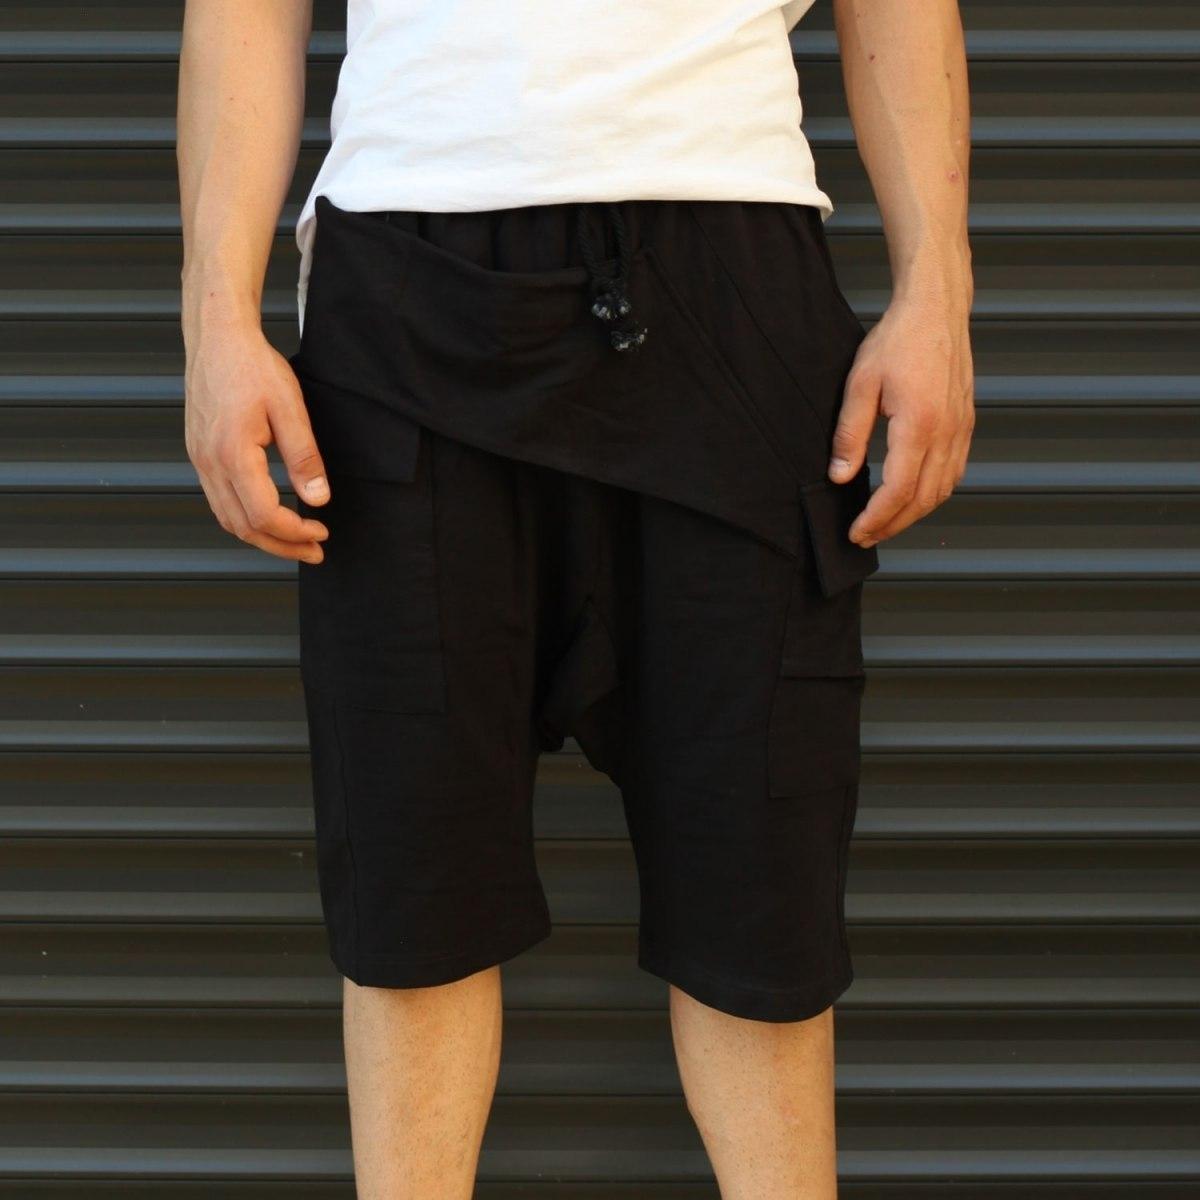 Men's Shalwar Design Fleece Sport Shorts With Side Pockets Black Mv Premium Brand - 2